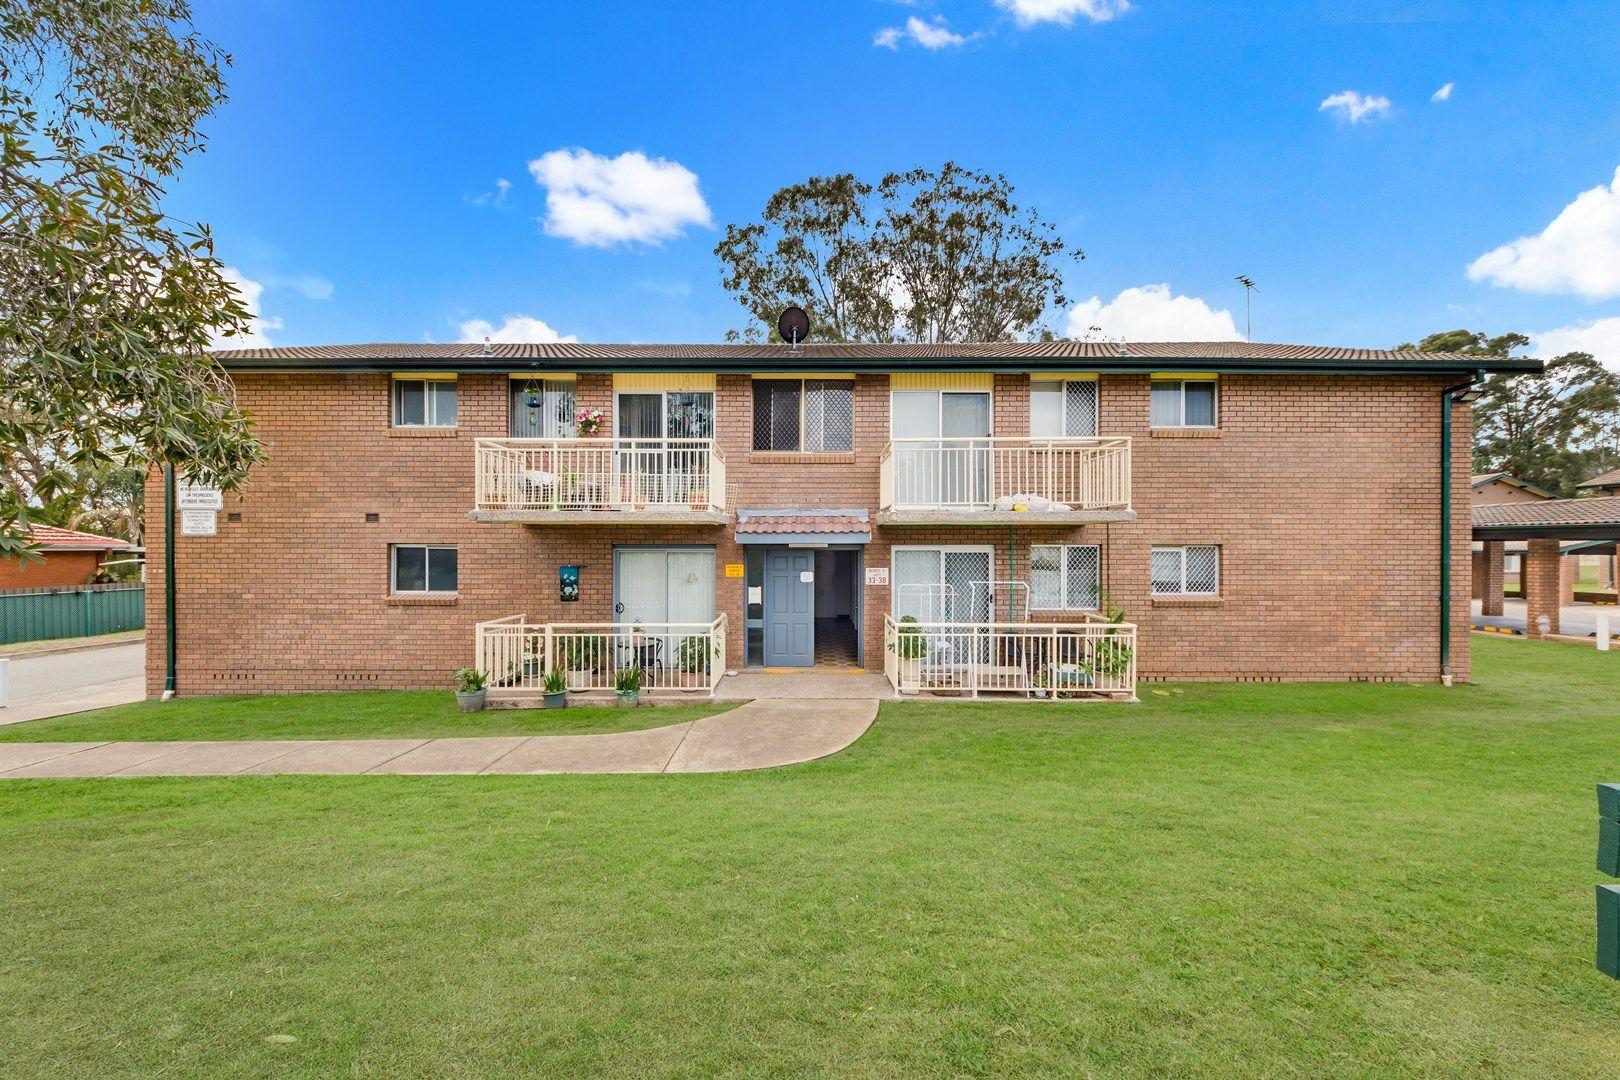 36/16 Derby Street, Minto NSW 2566, Image 0